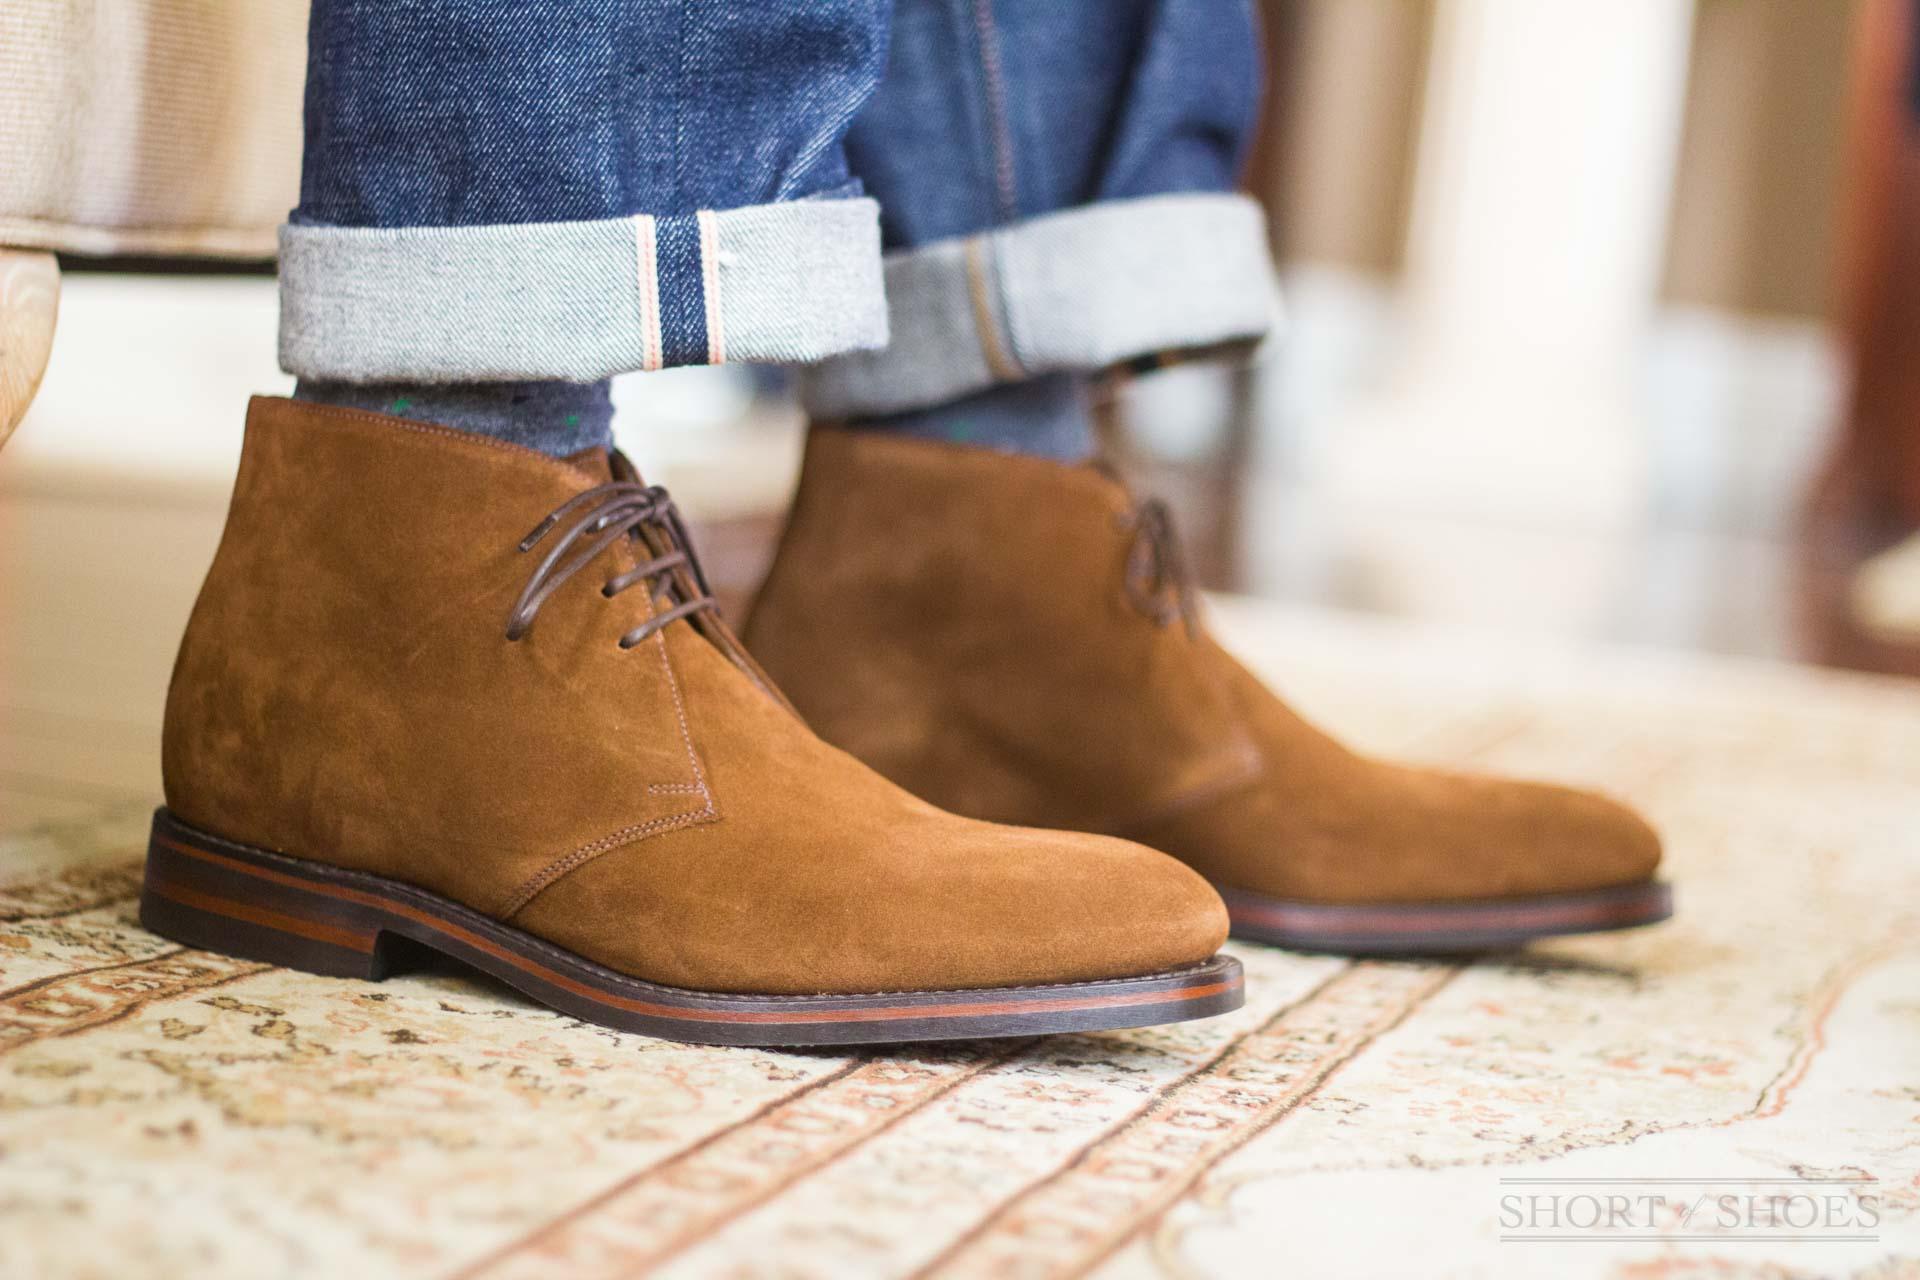 ee63b665b86 Loake Shoes Review - Kempton Suede Chukka 1880 Line